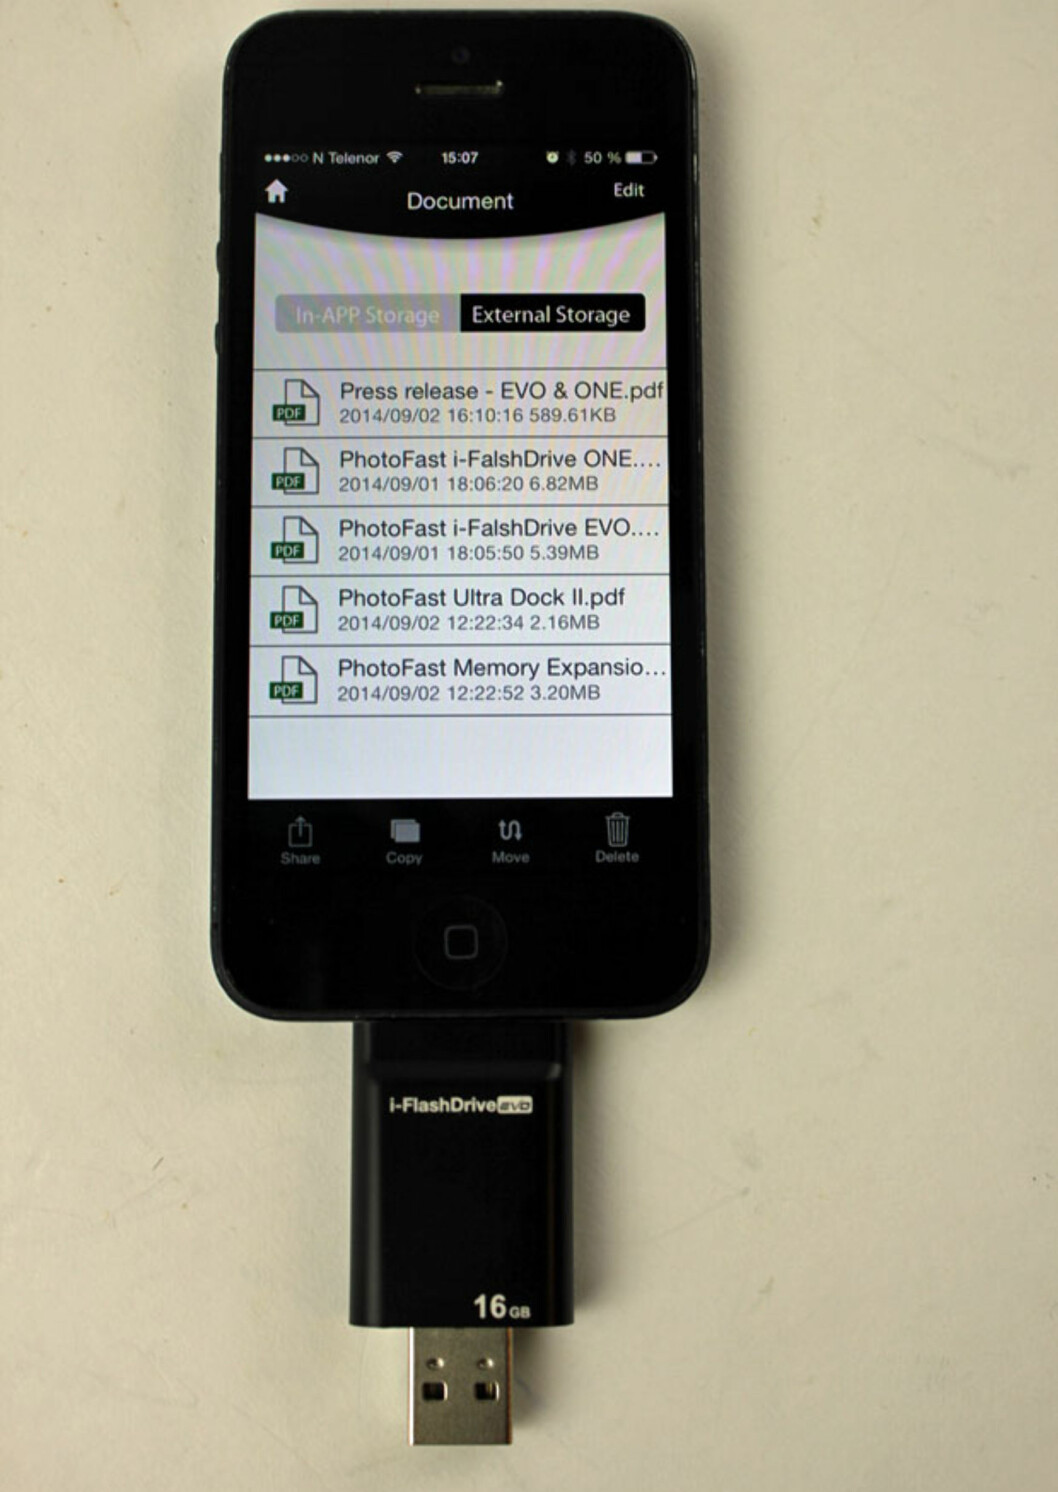 <strong><b>i-FlashDrive:</strong></b> Appens listing av dokumenter du har på minnekortet. Foto: ØYVIND PAULSEN